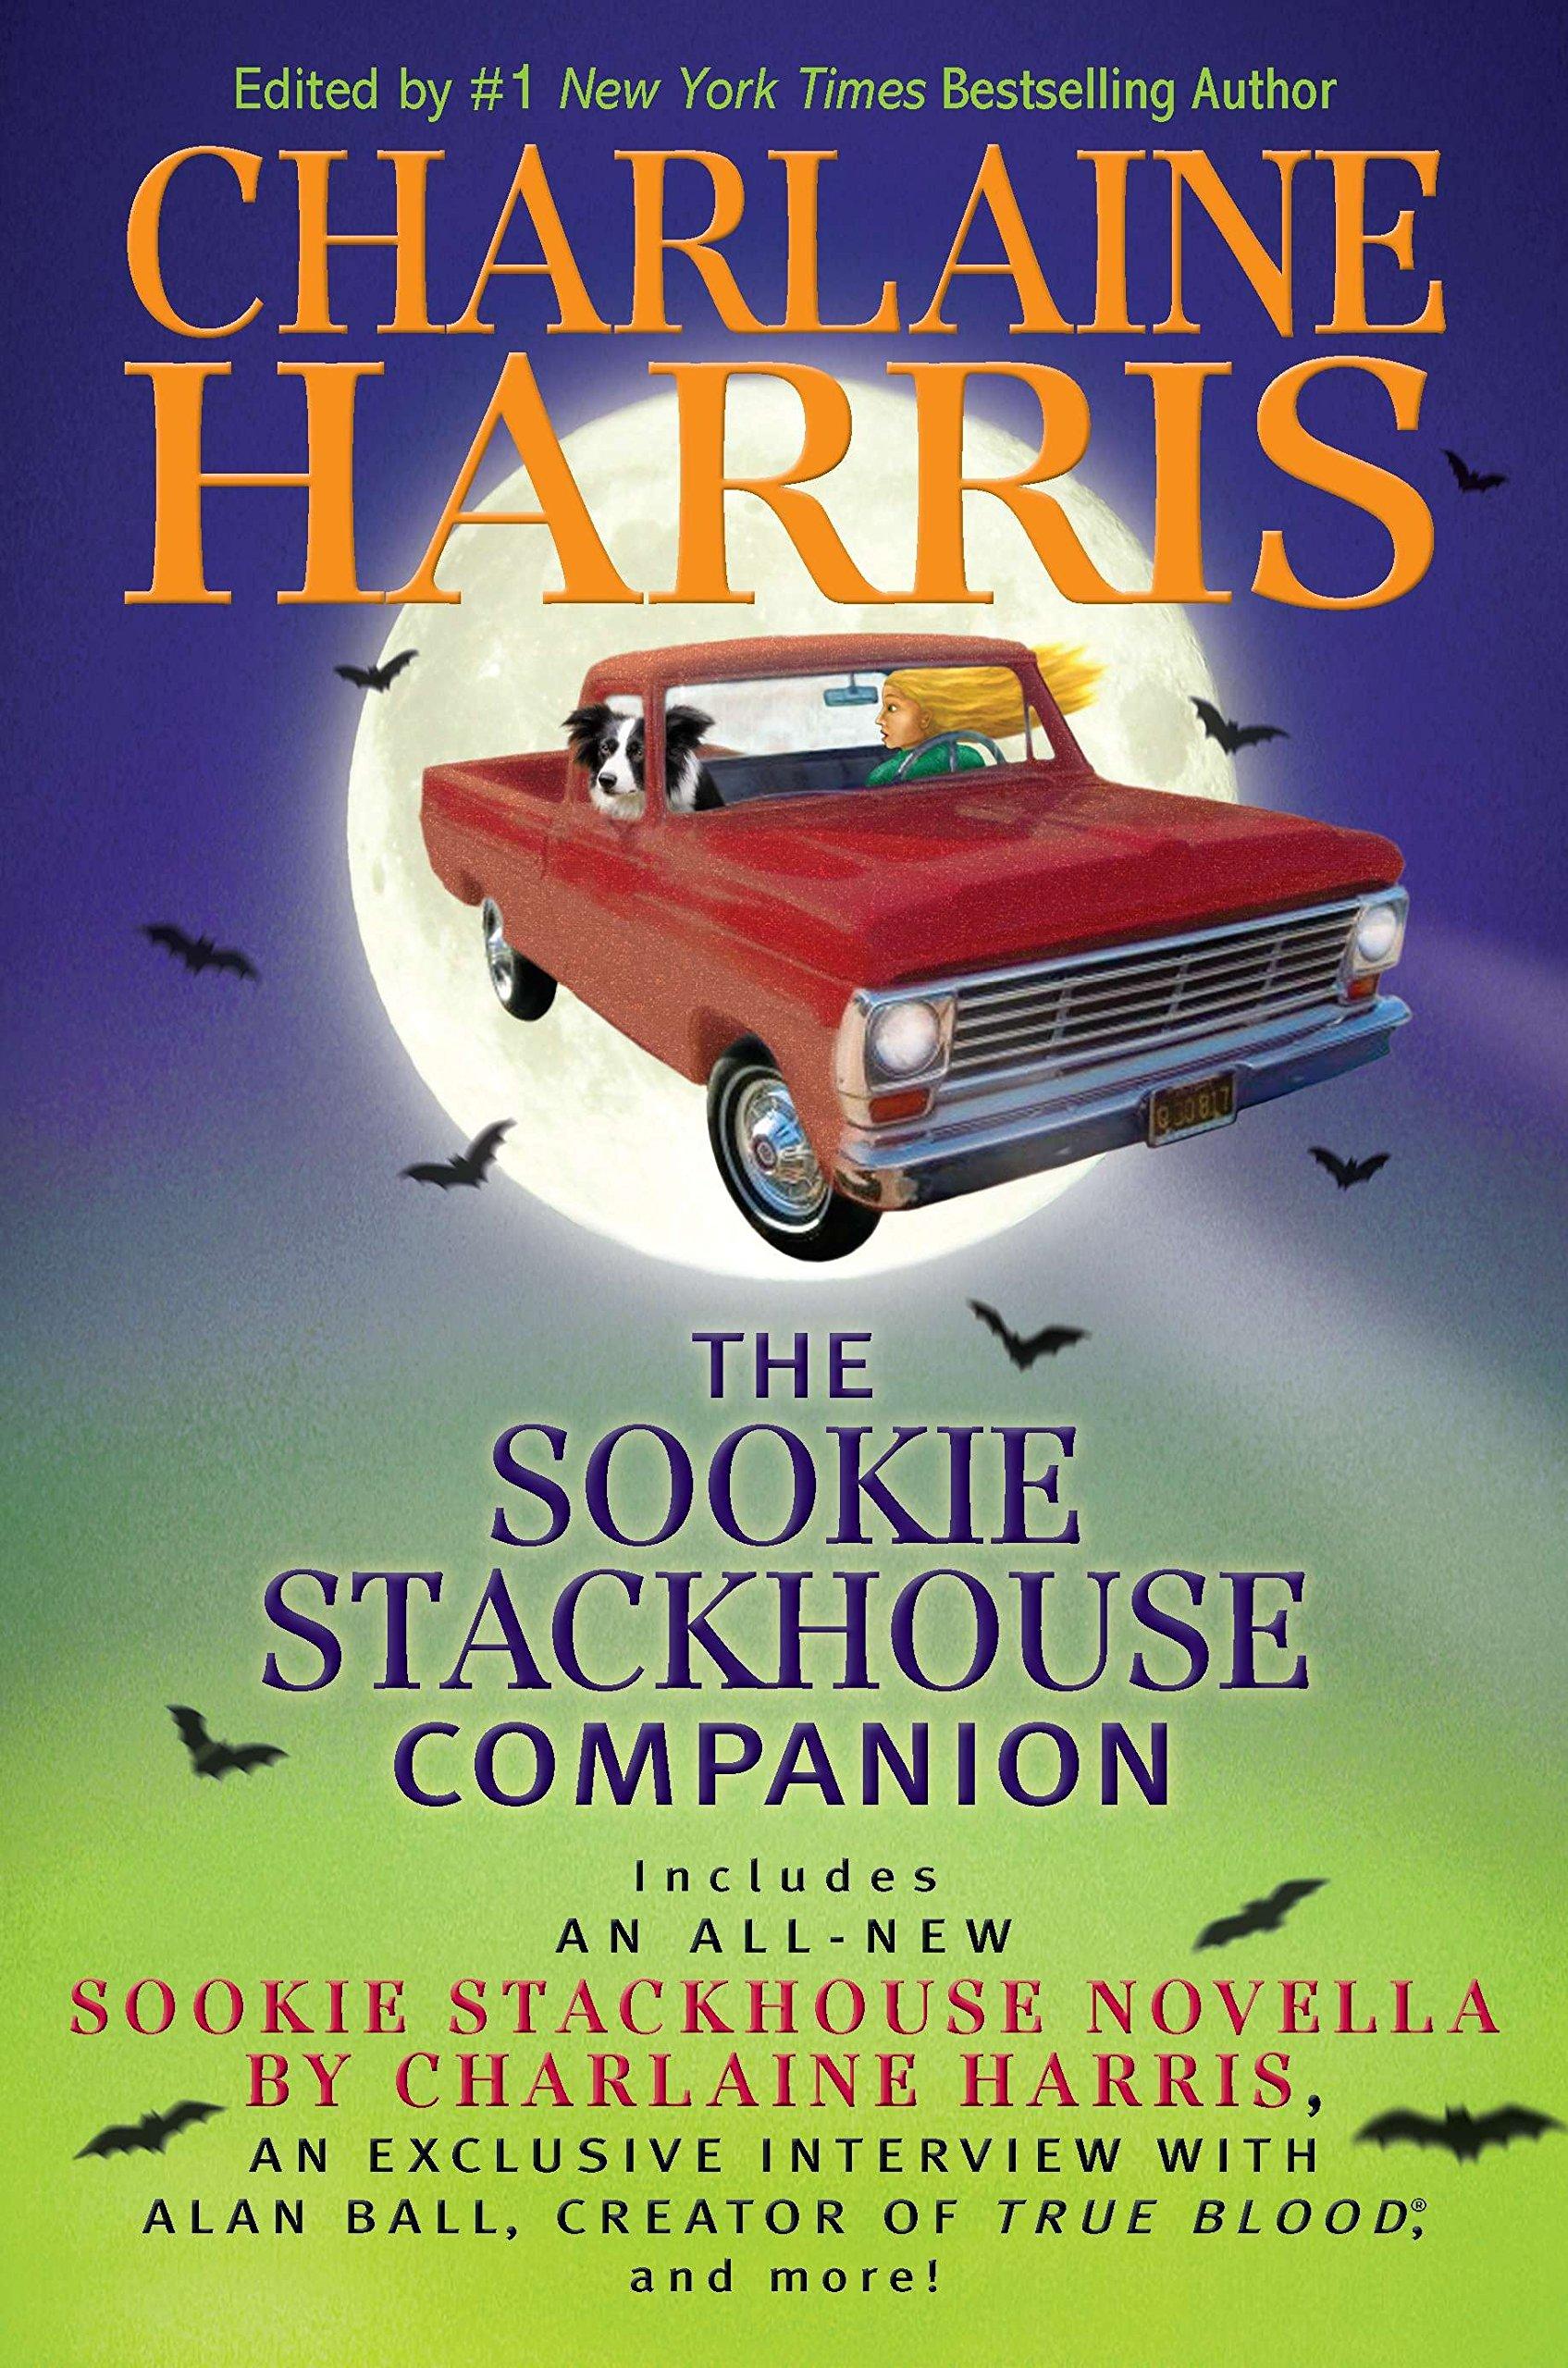 The Sookie Stackhouse Companion (Sookie Stackhouse/True Blood) PDF